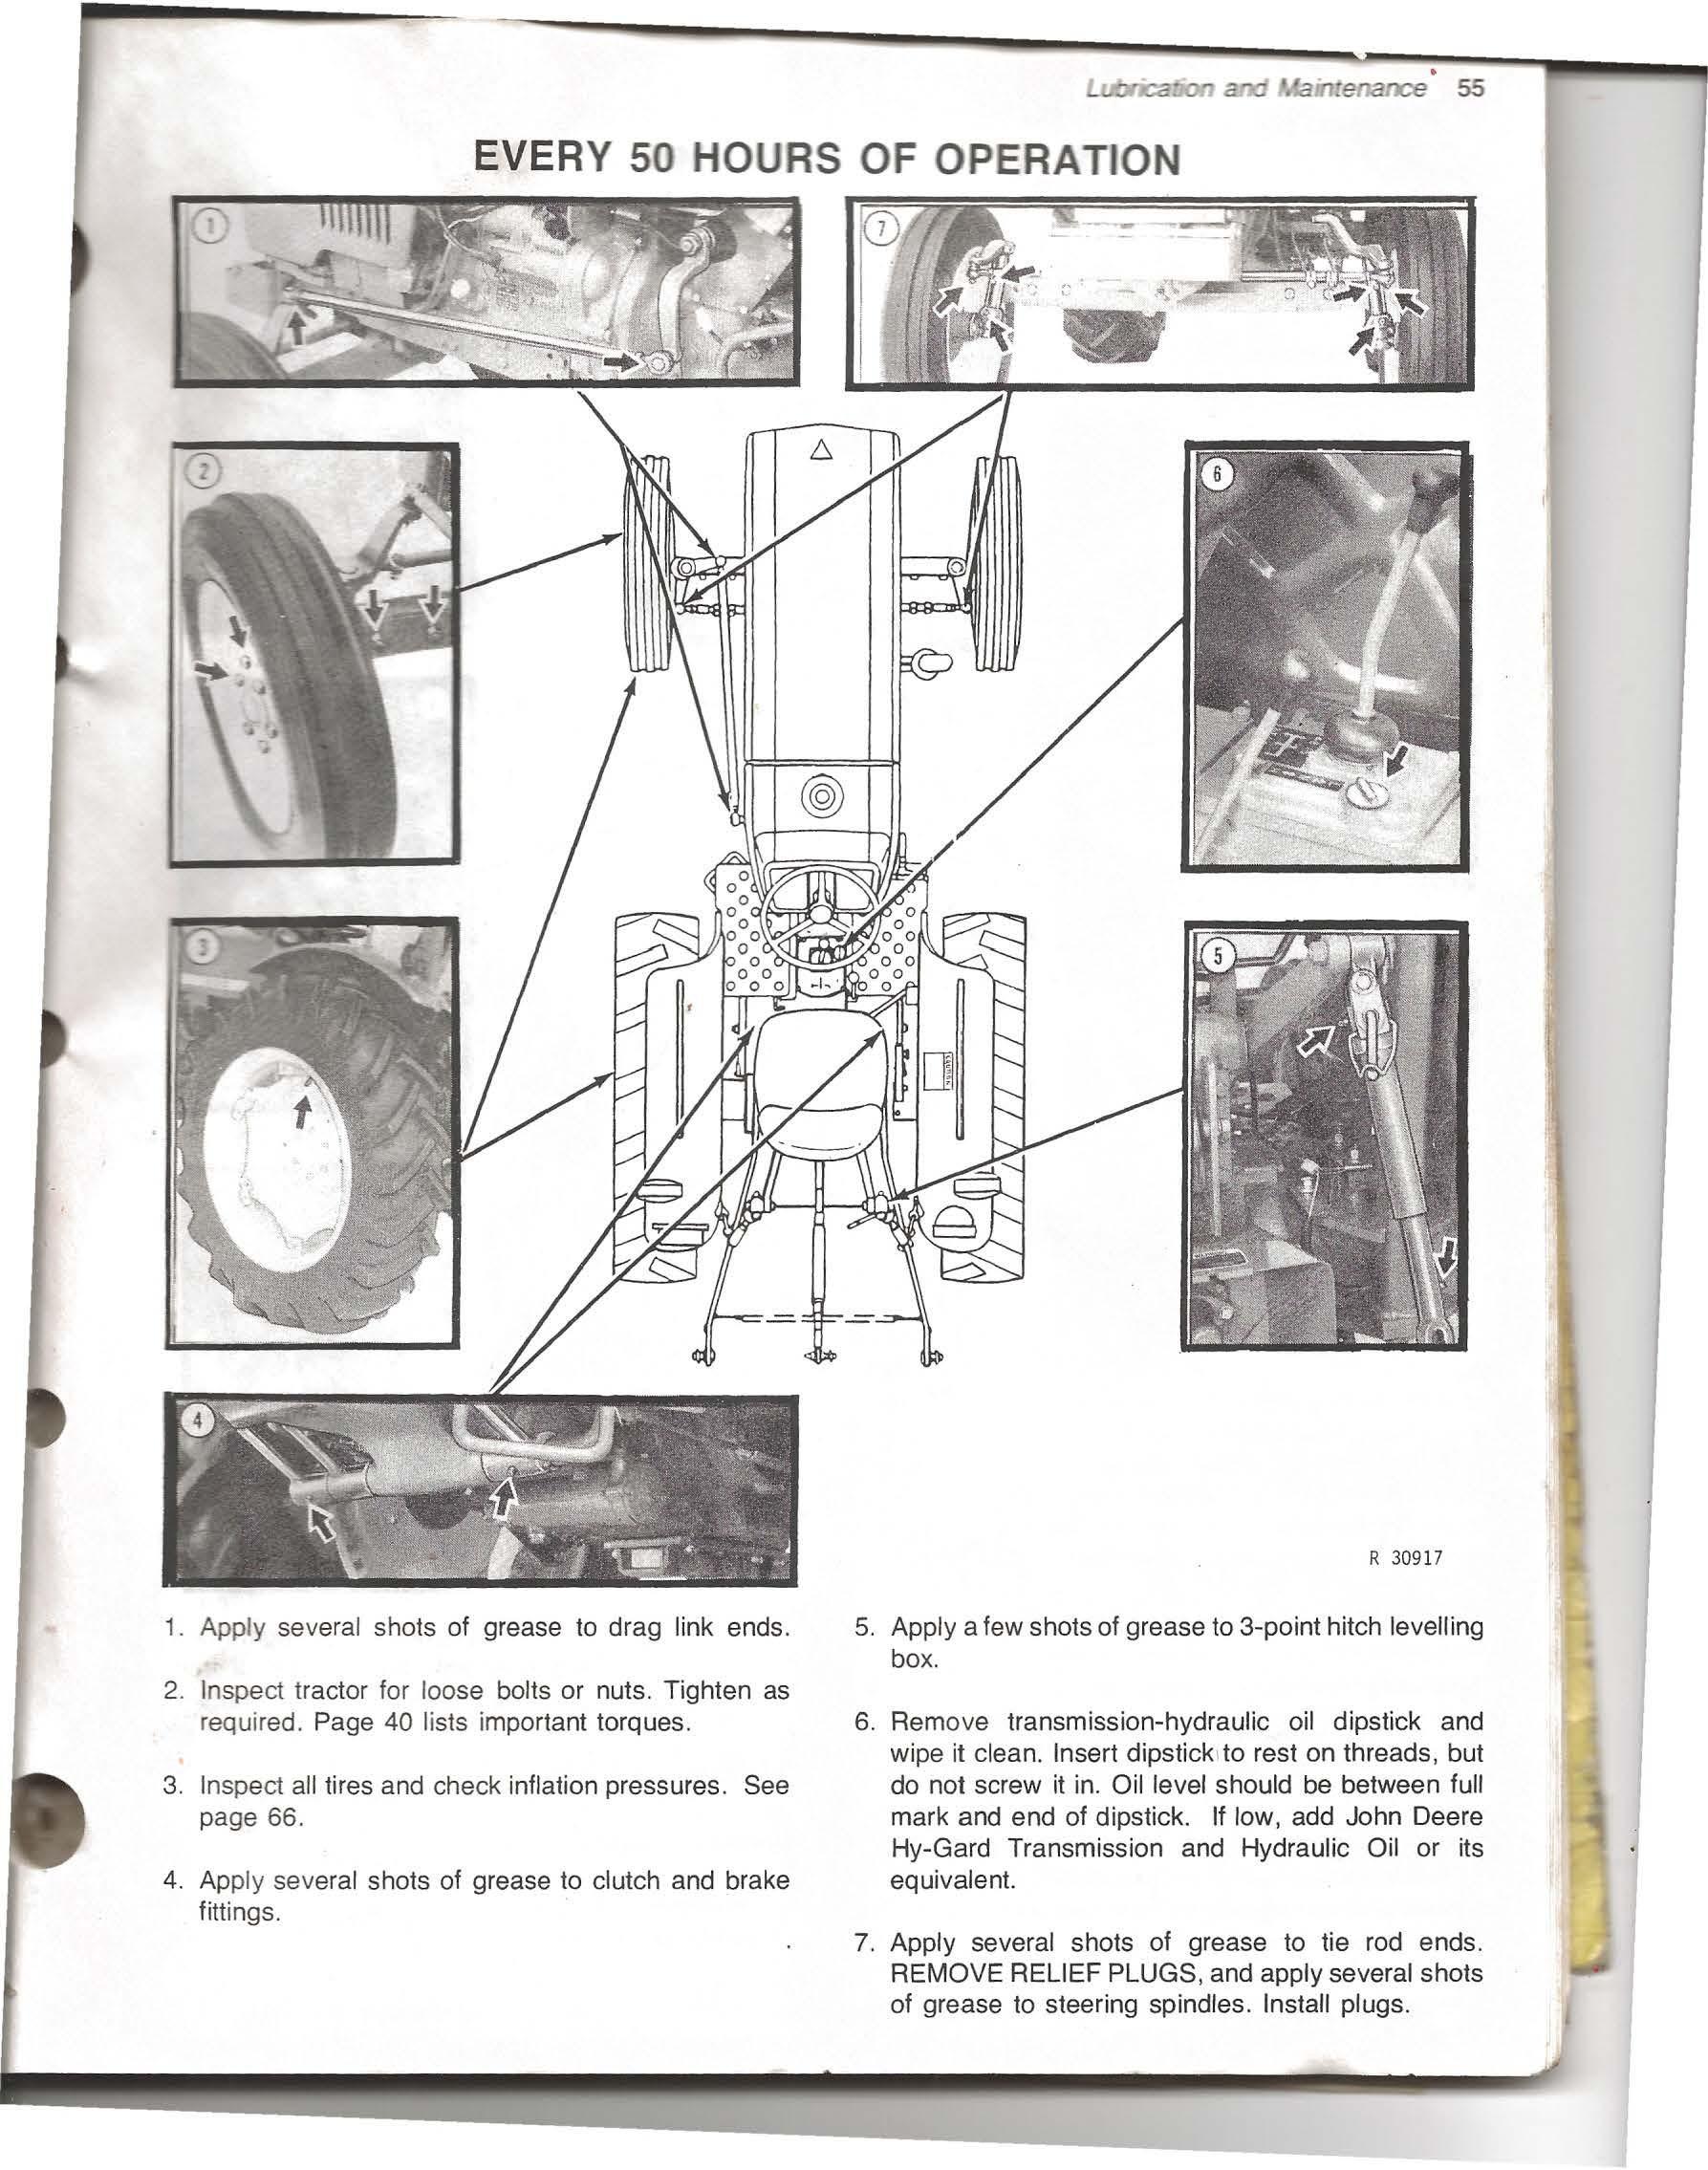 john deere 850 950 operator manual photos good_Page_57?resize=474%2C602&ssl=1 my john deere 950 operator's manual poudre river stables